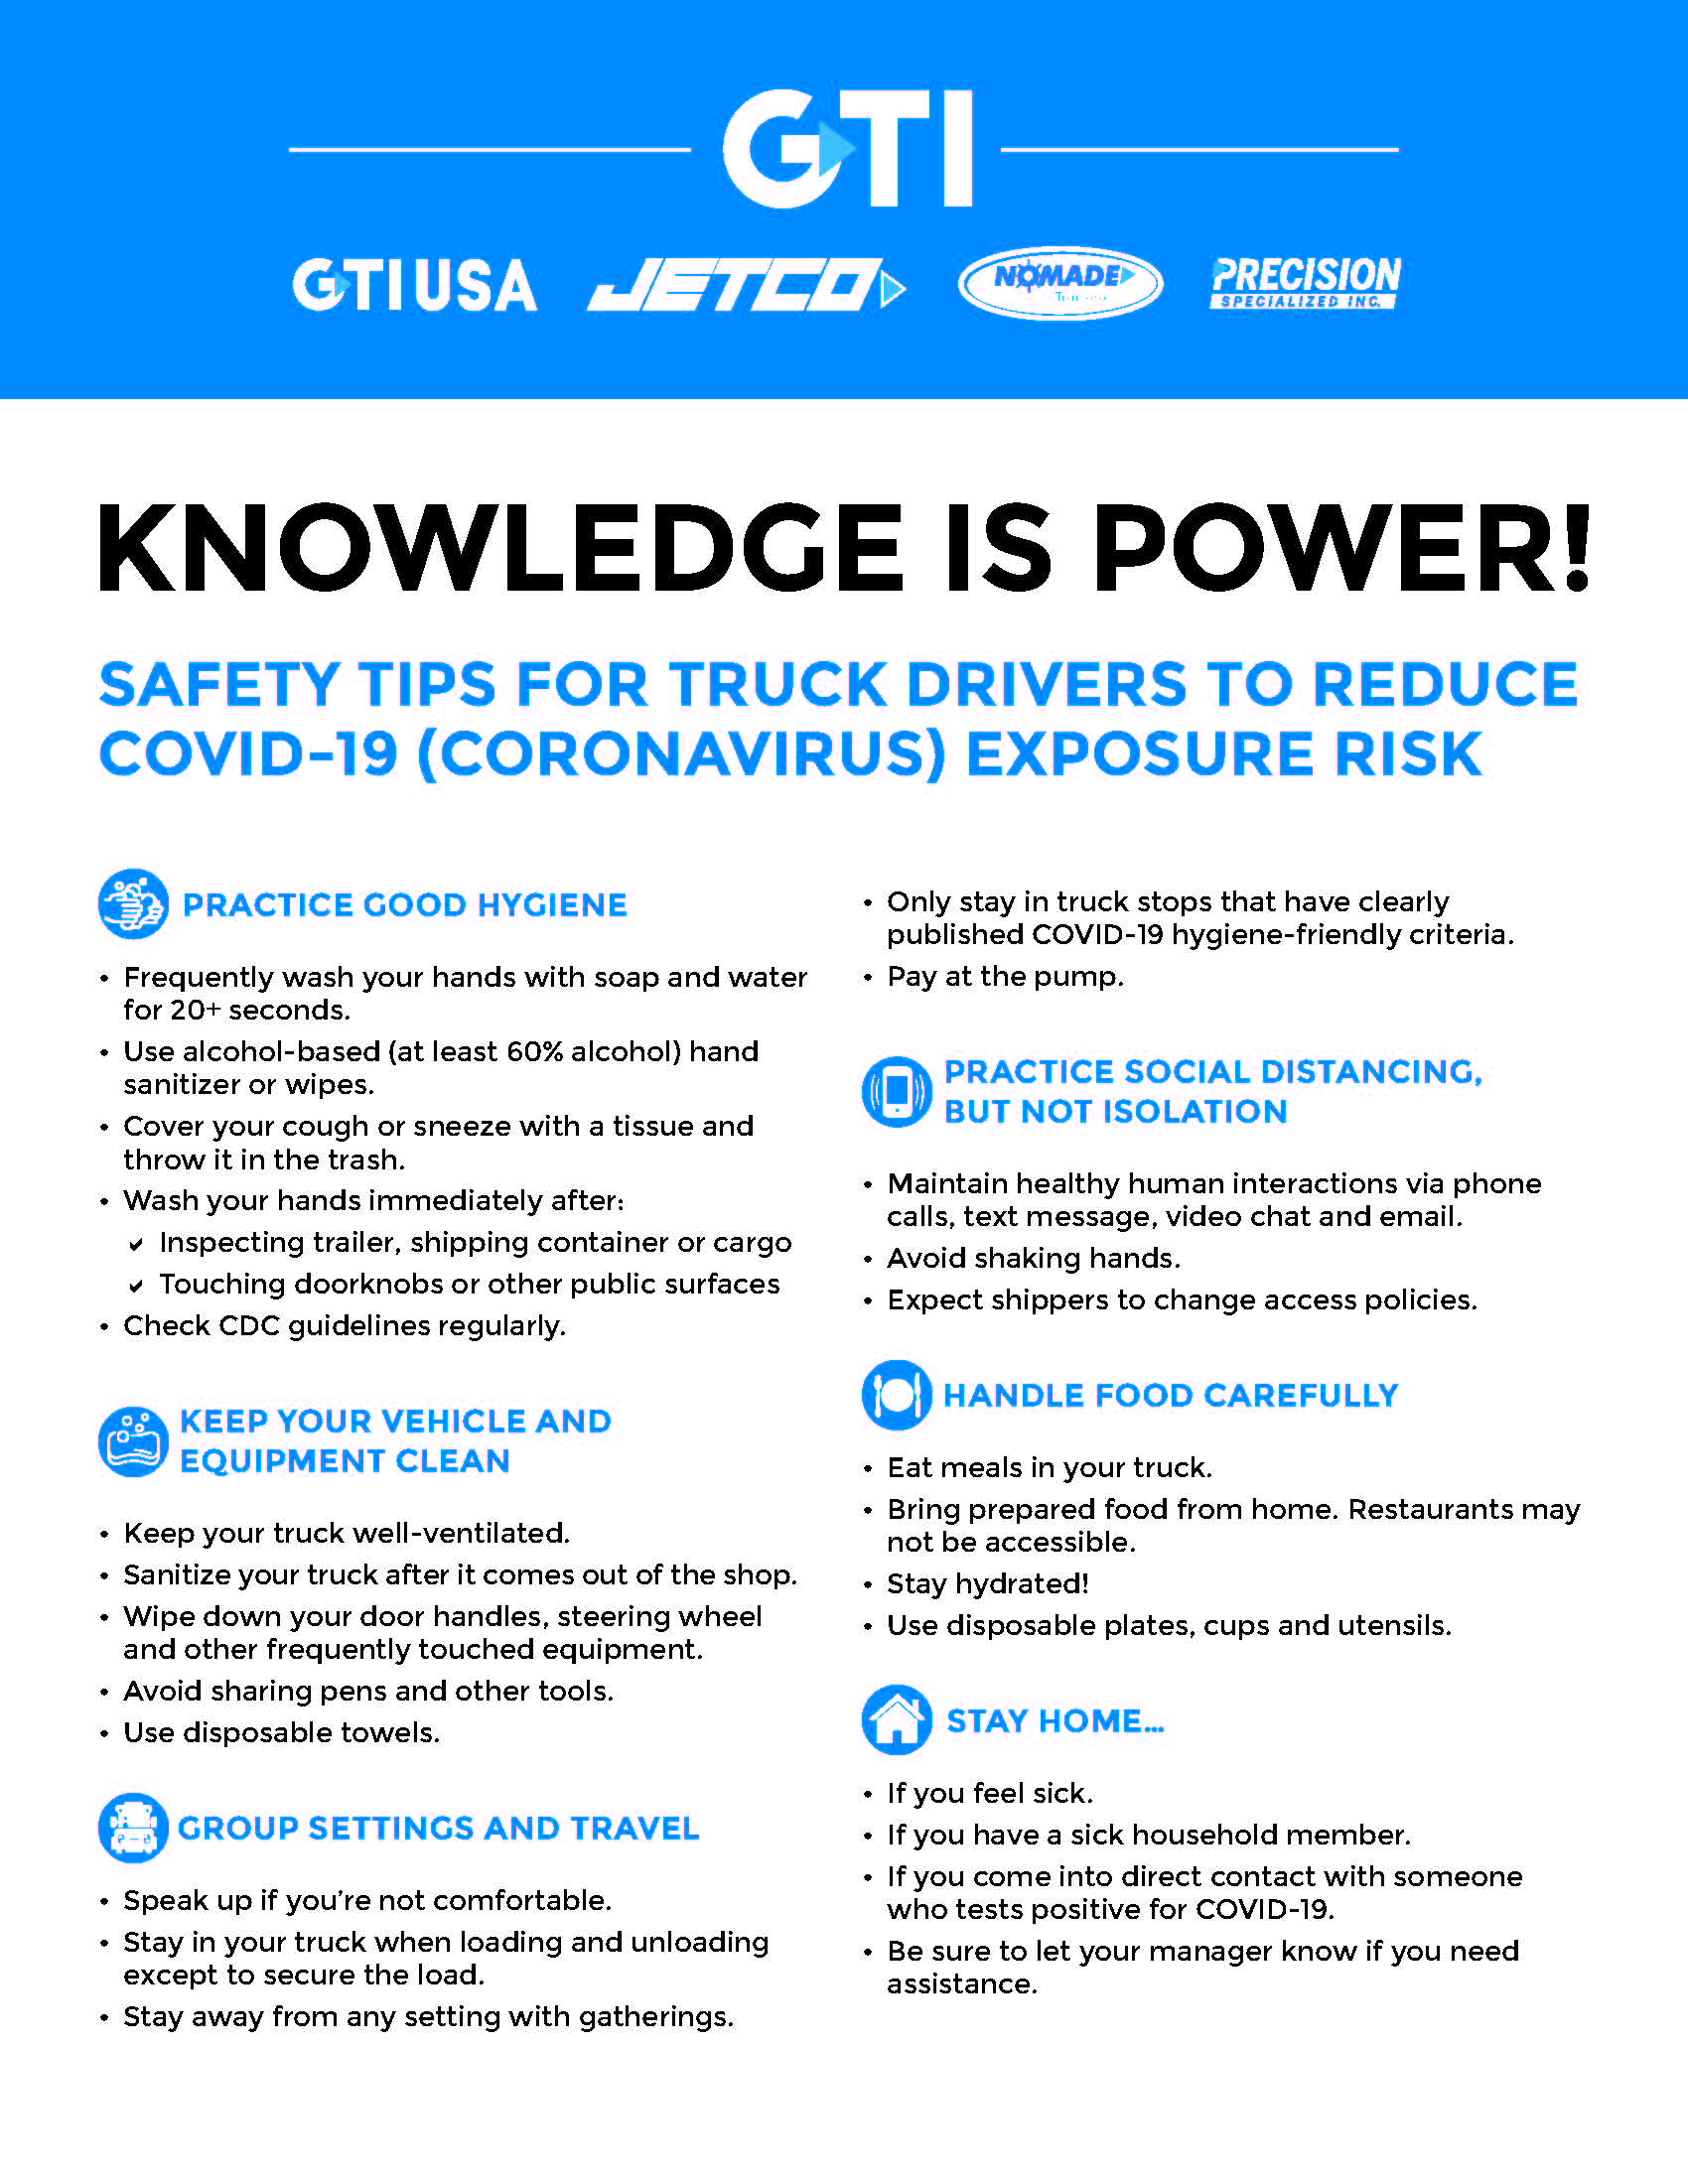 JET_GTI_COVID-19_DriverSafetyTips_031820